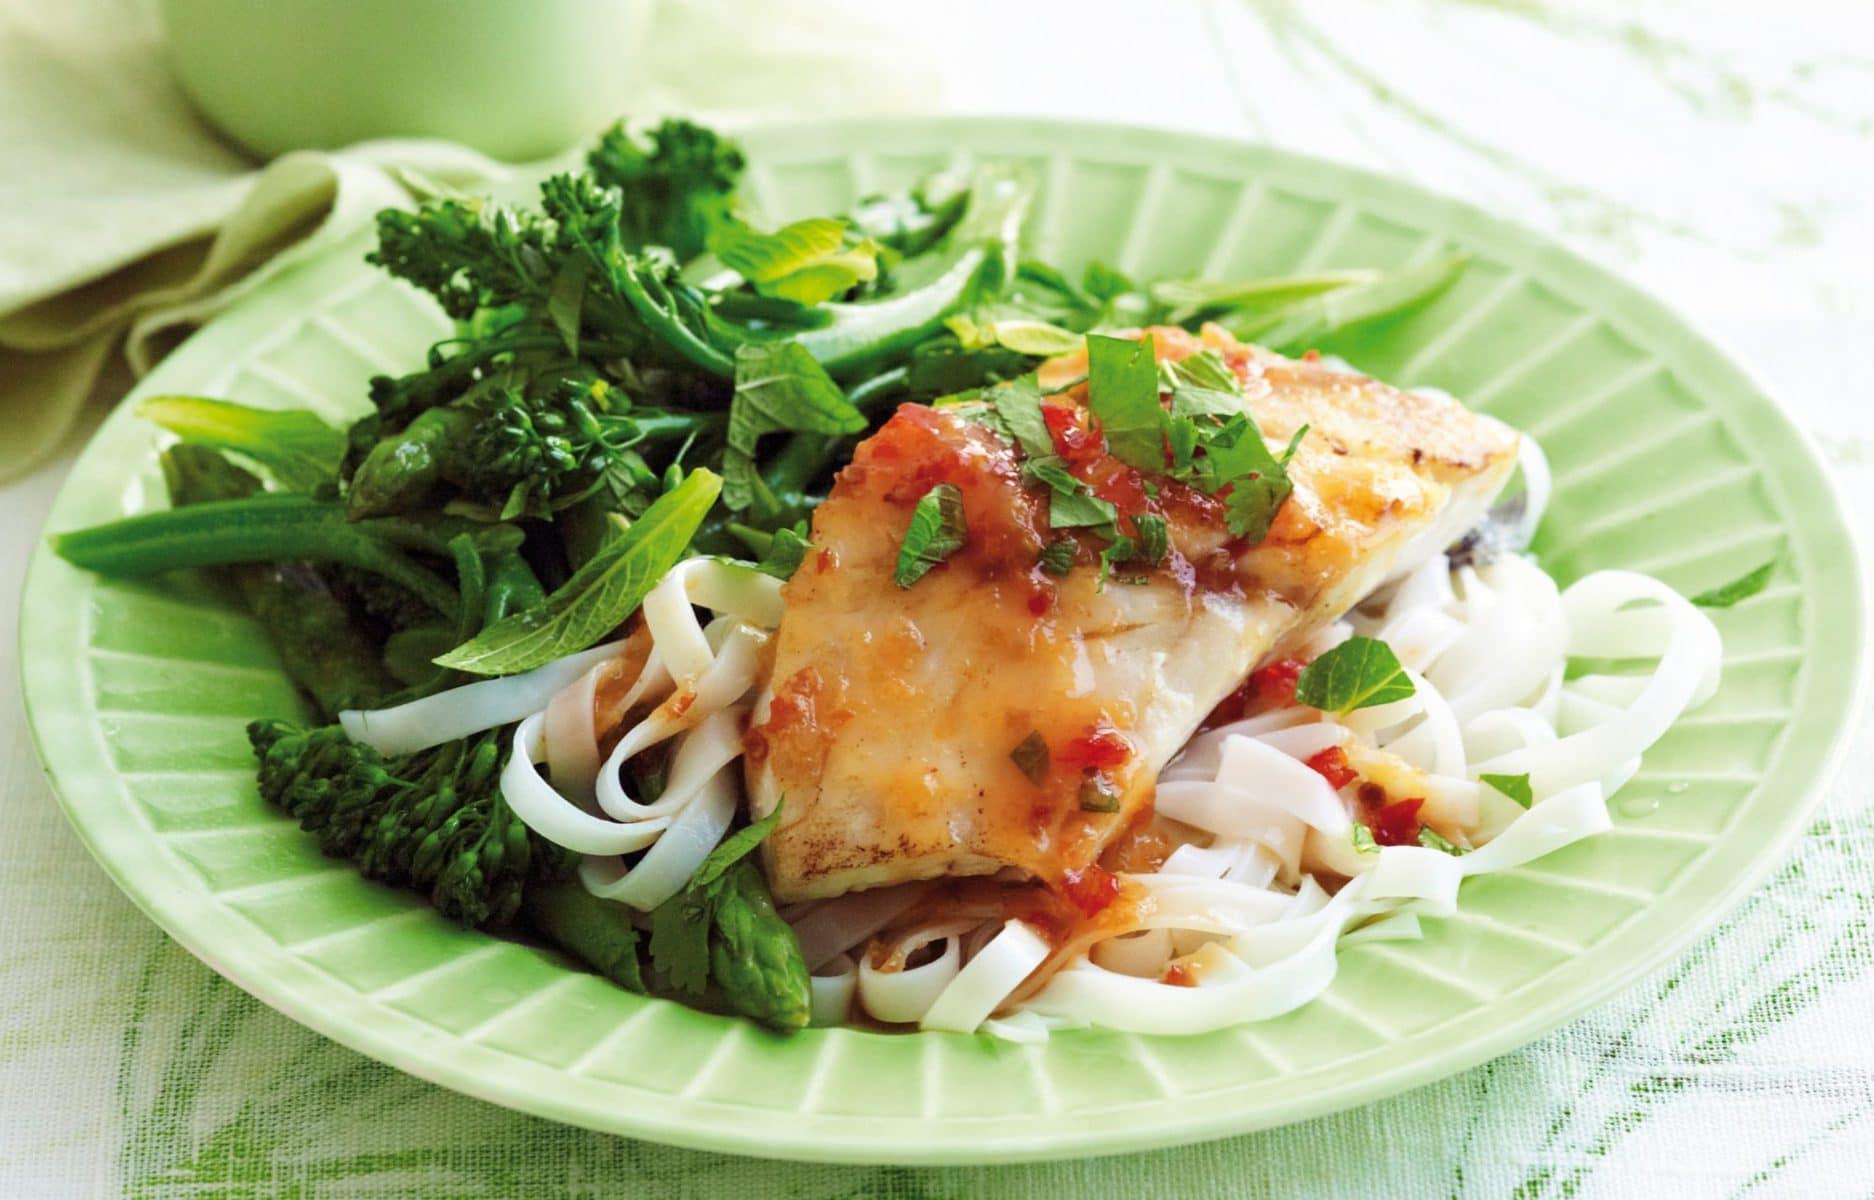 Thai-style fish with fresh herbs